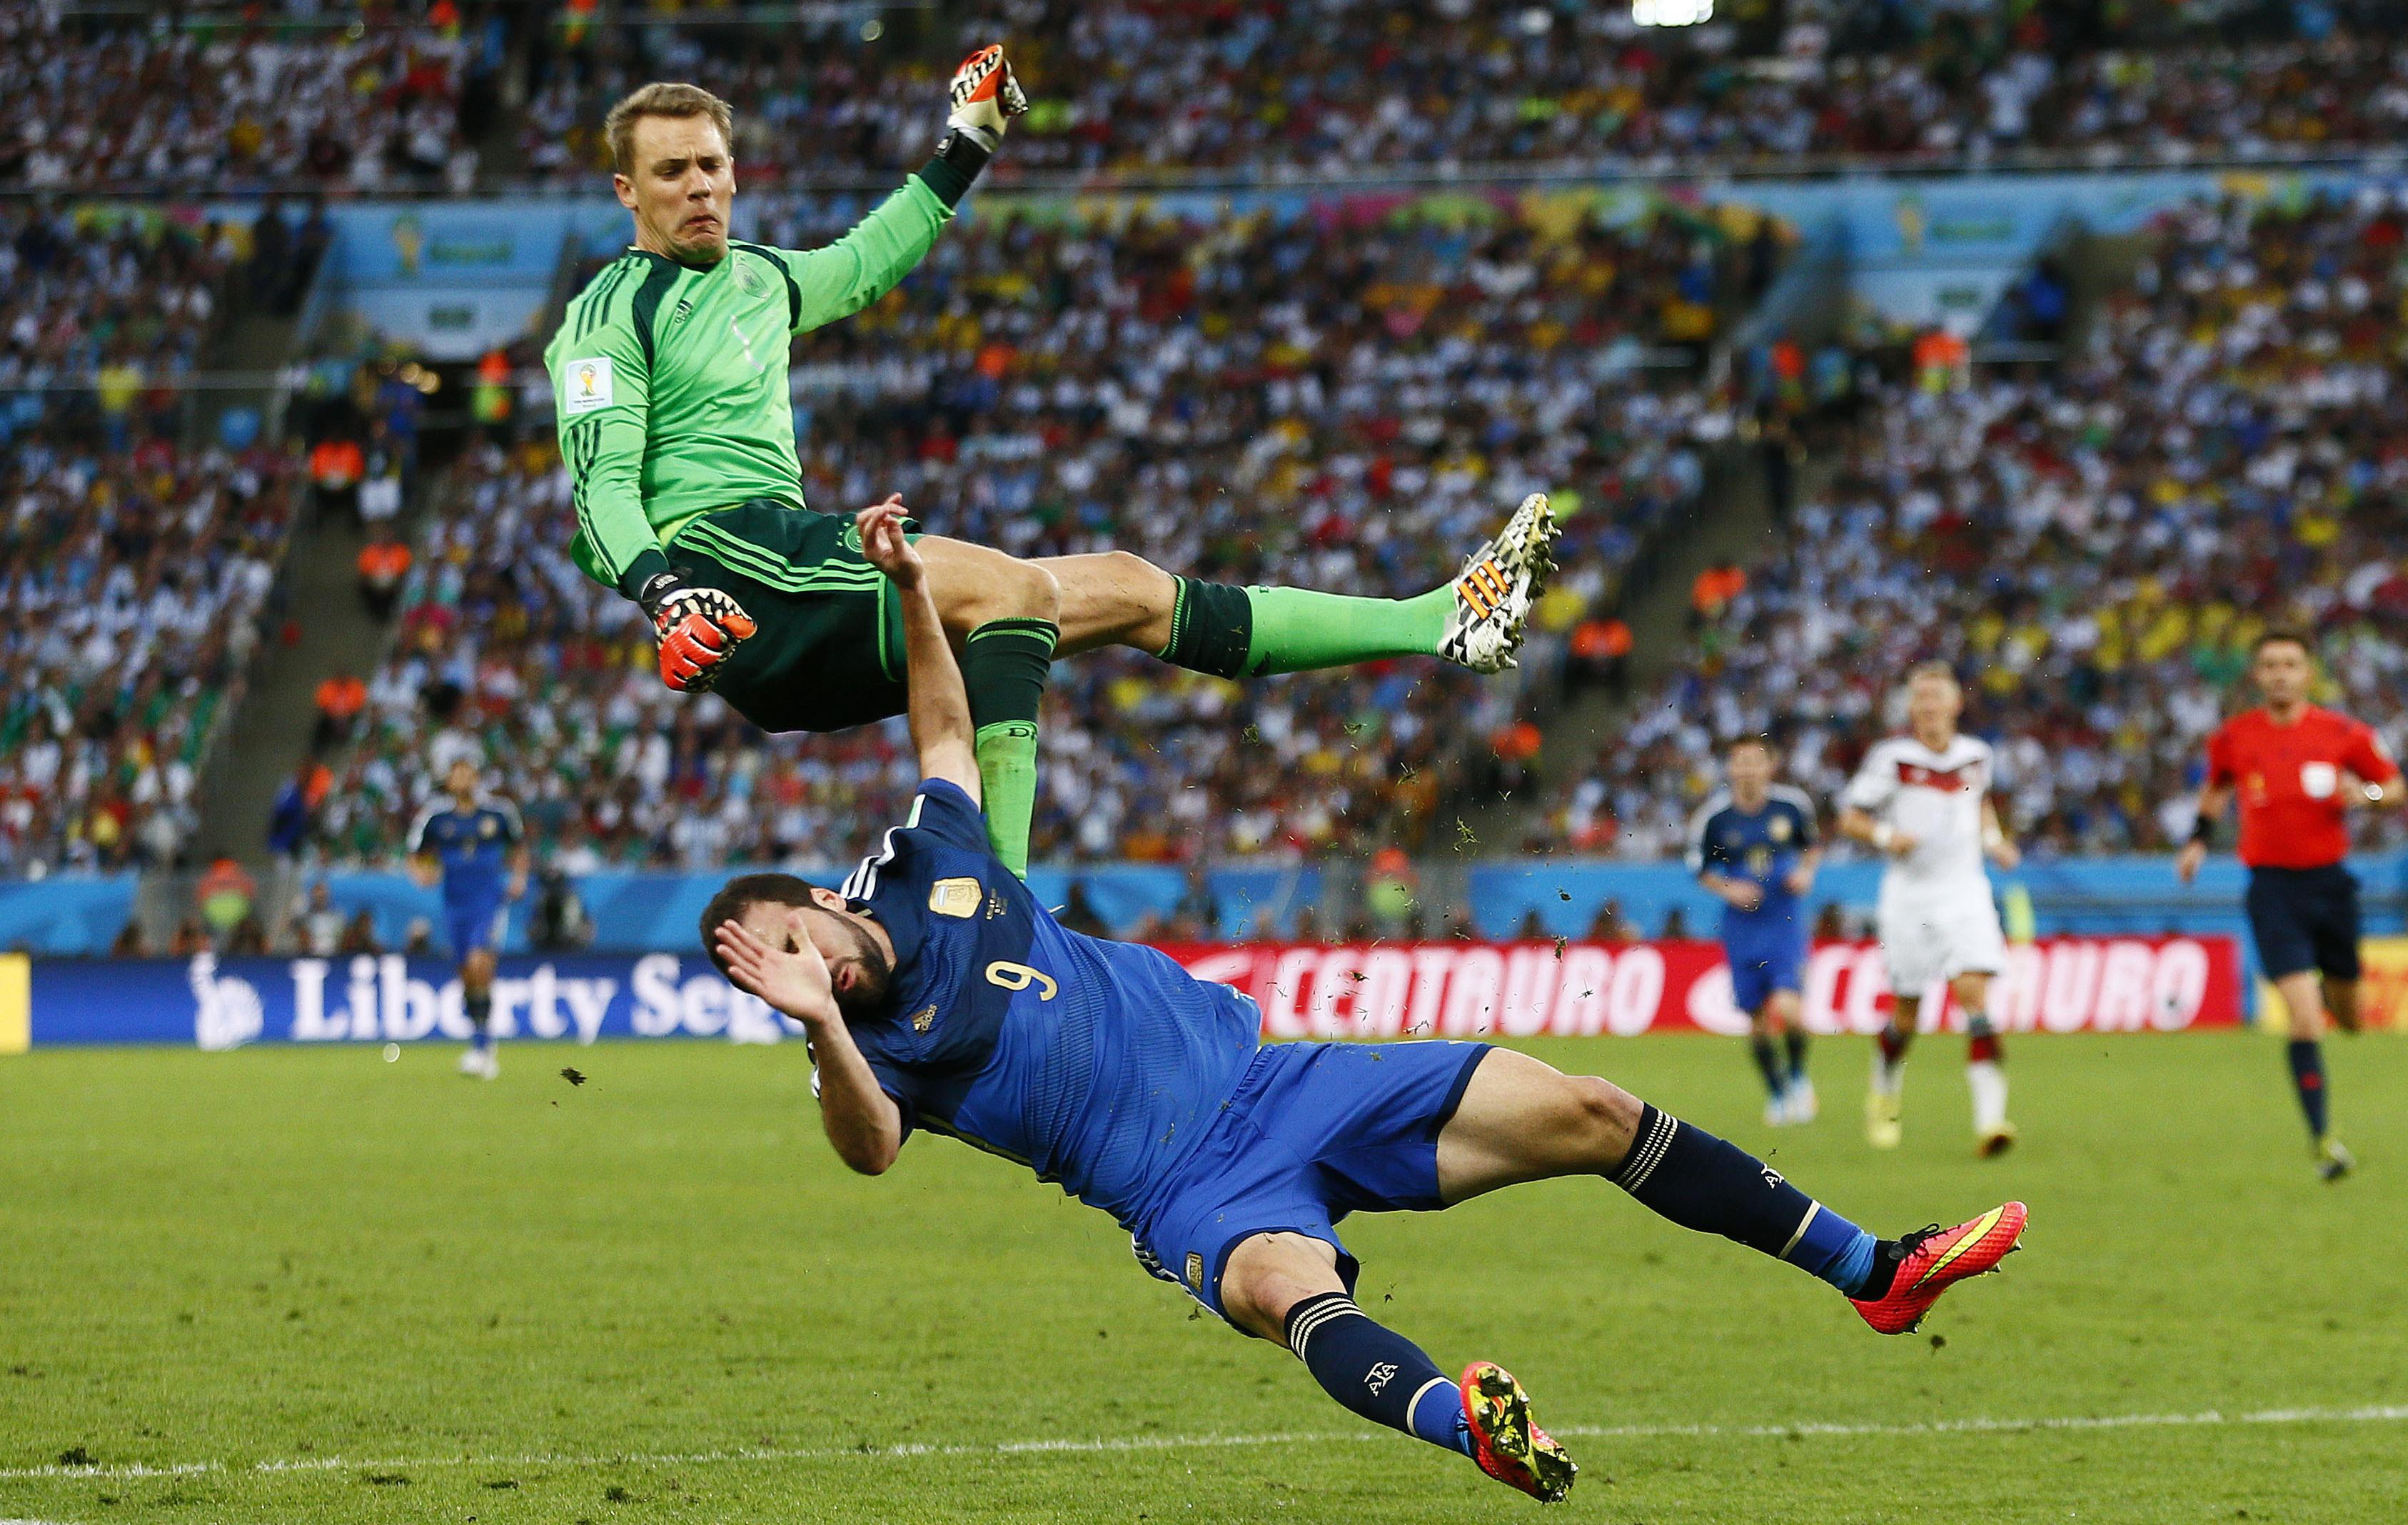 Neuer la muraille allemande 2014 br sil coupe du monde football - Jeux de football coupe du monde 2014 ...